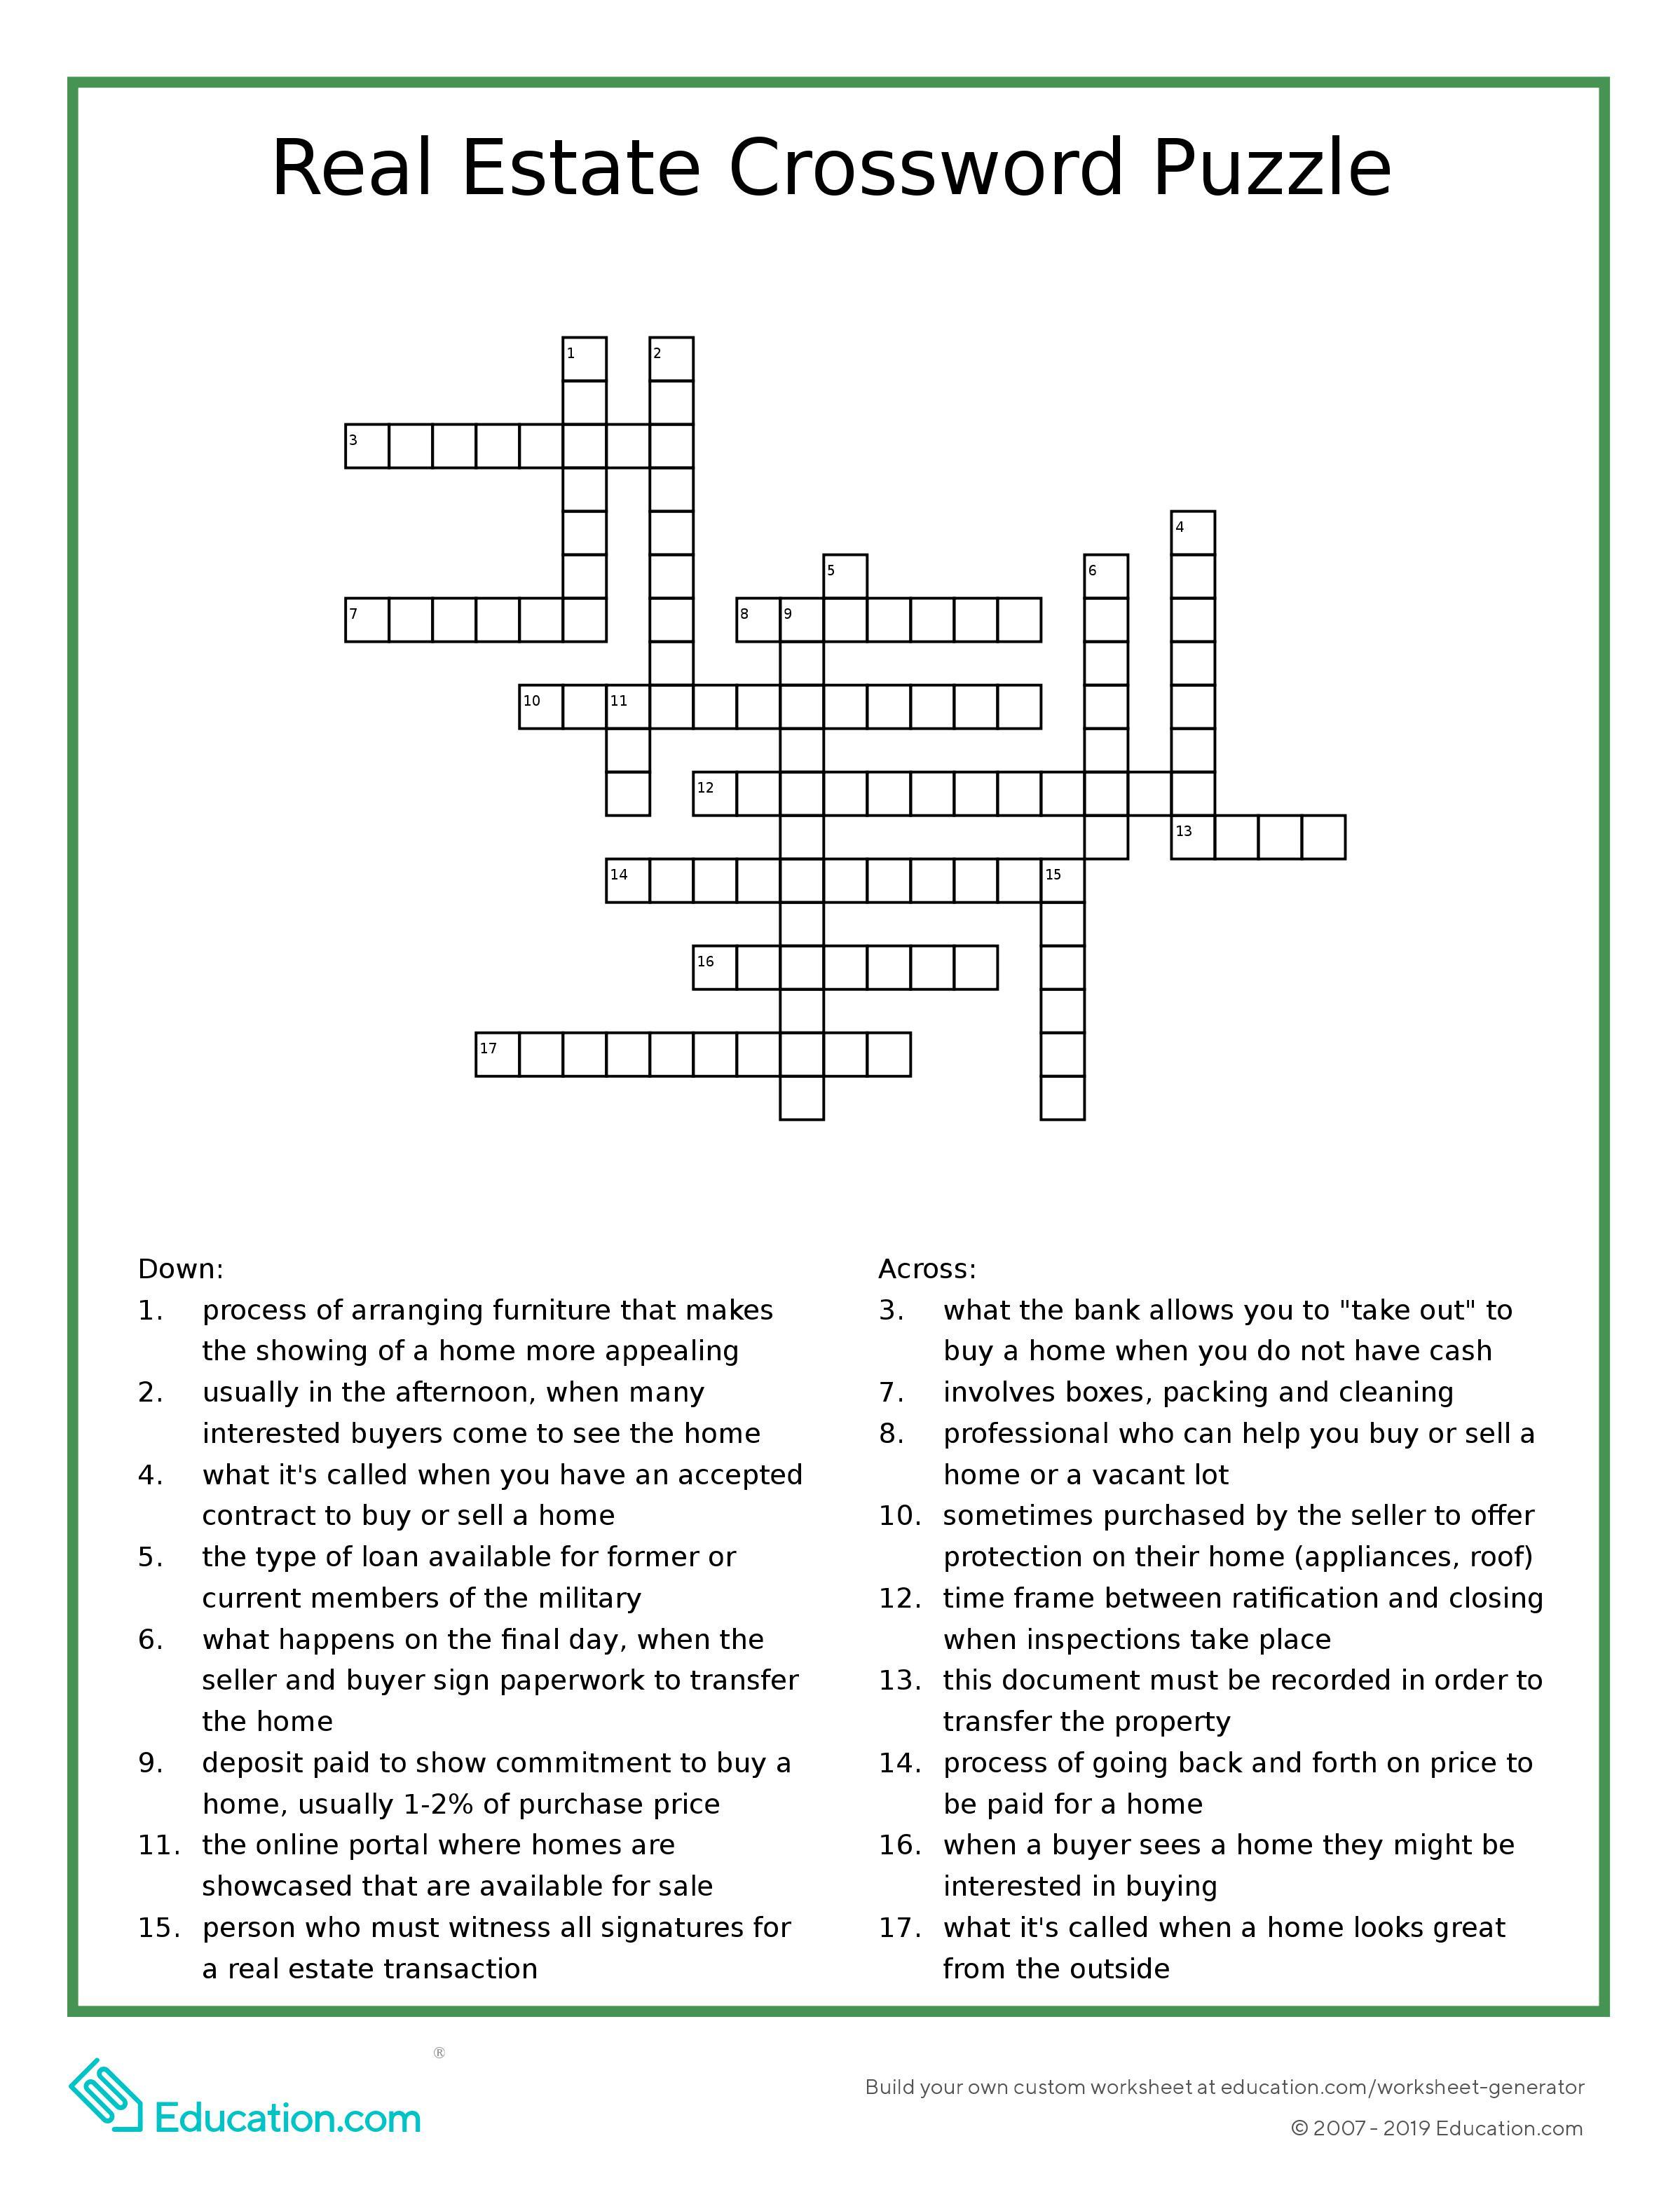 Real Estate Crossword Puzzle.jpg